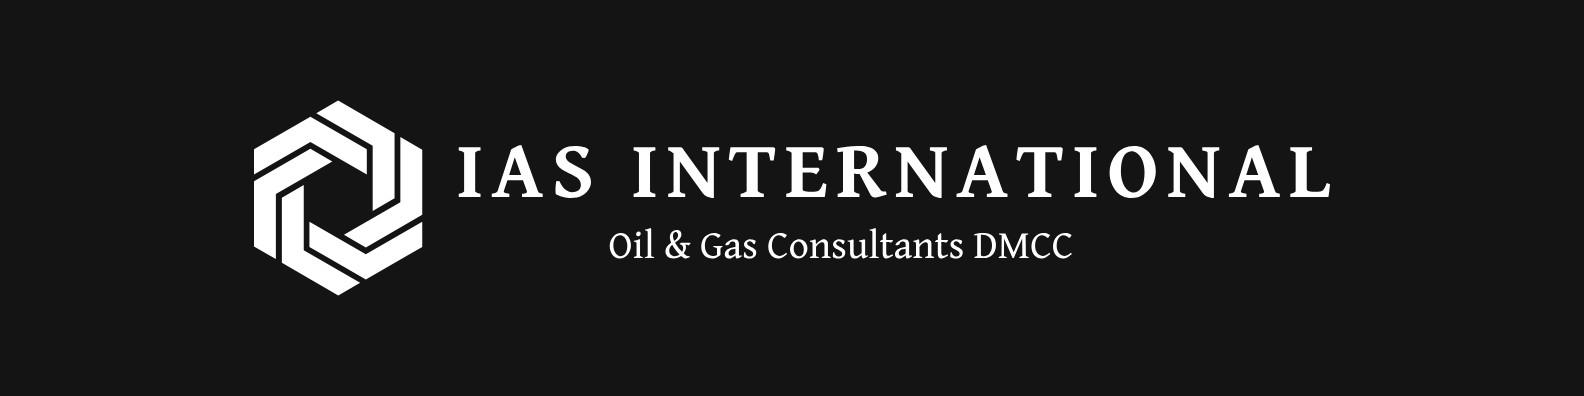 IAS International Oil & Gas Consultants DMCC | LinkedIn